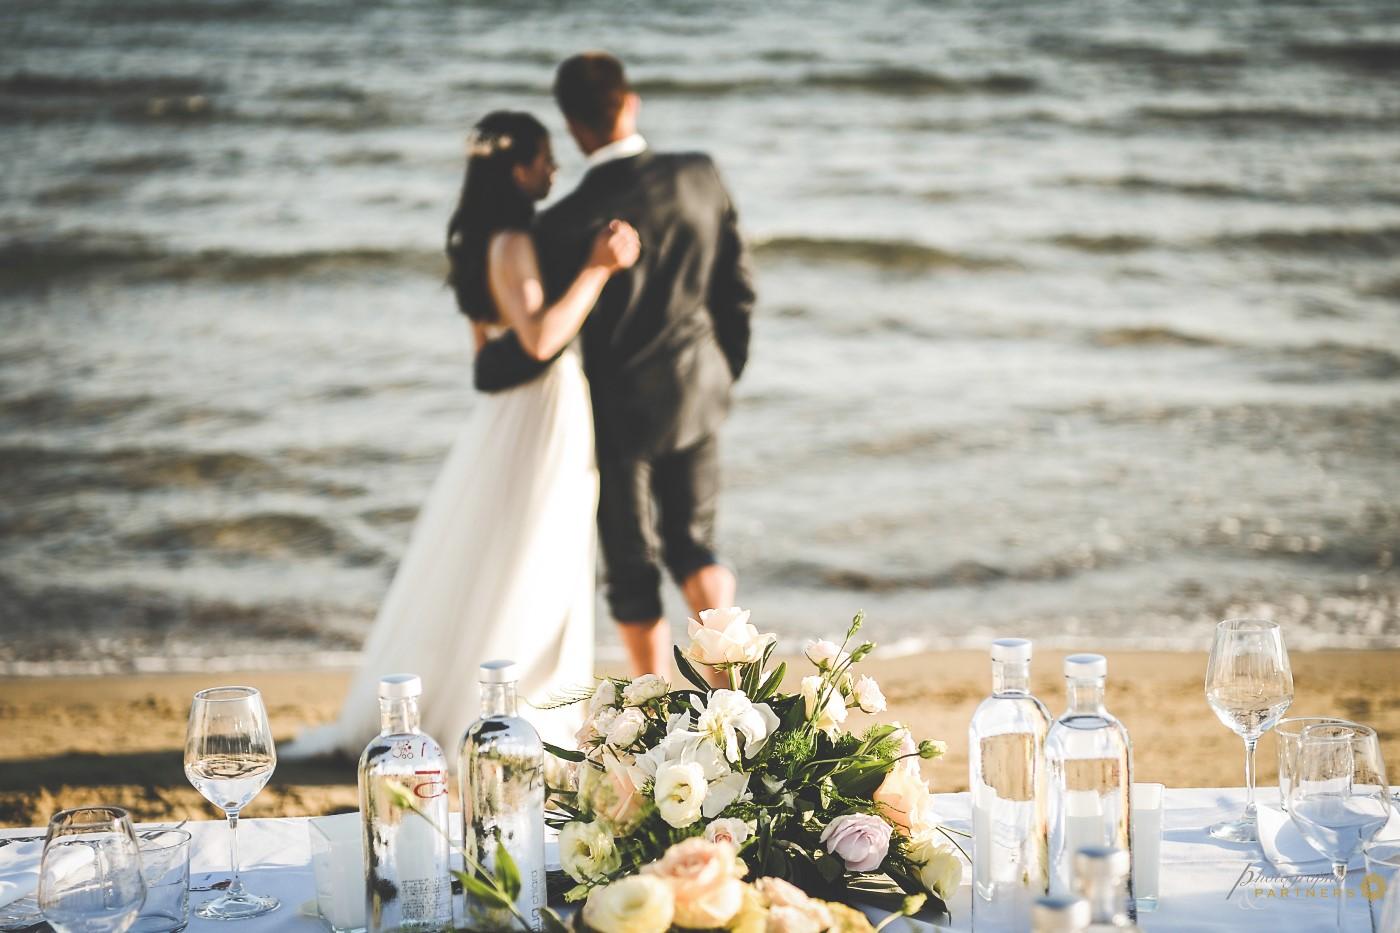 photographer_weddings_grosseto_17.jpg